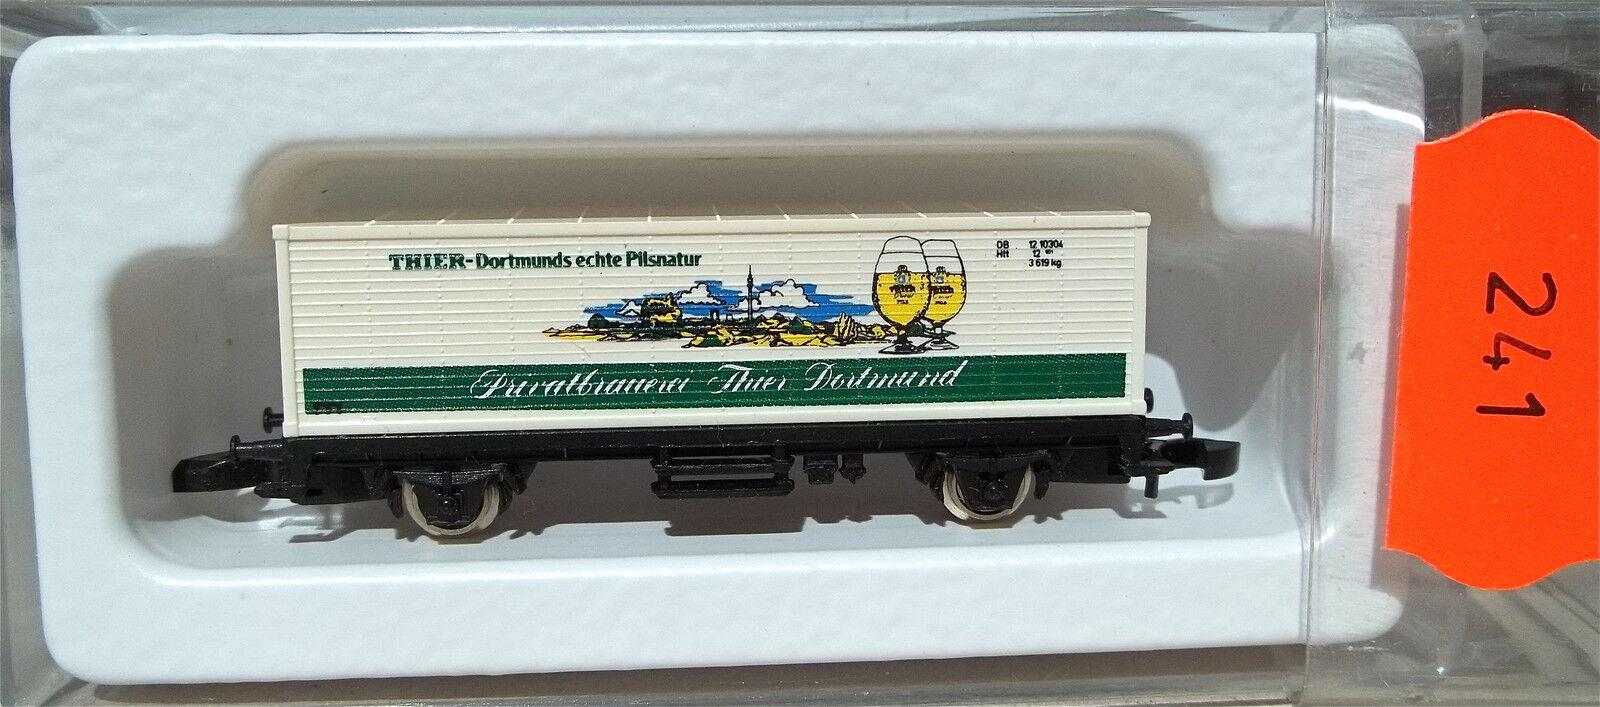 Dethier Dortmund, container Carrello partire 87001   8615 Z 1/220 * 241 *